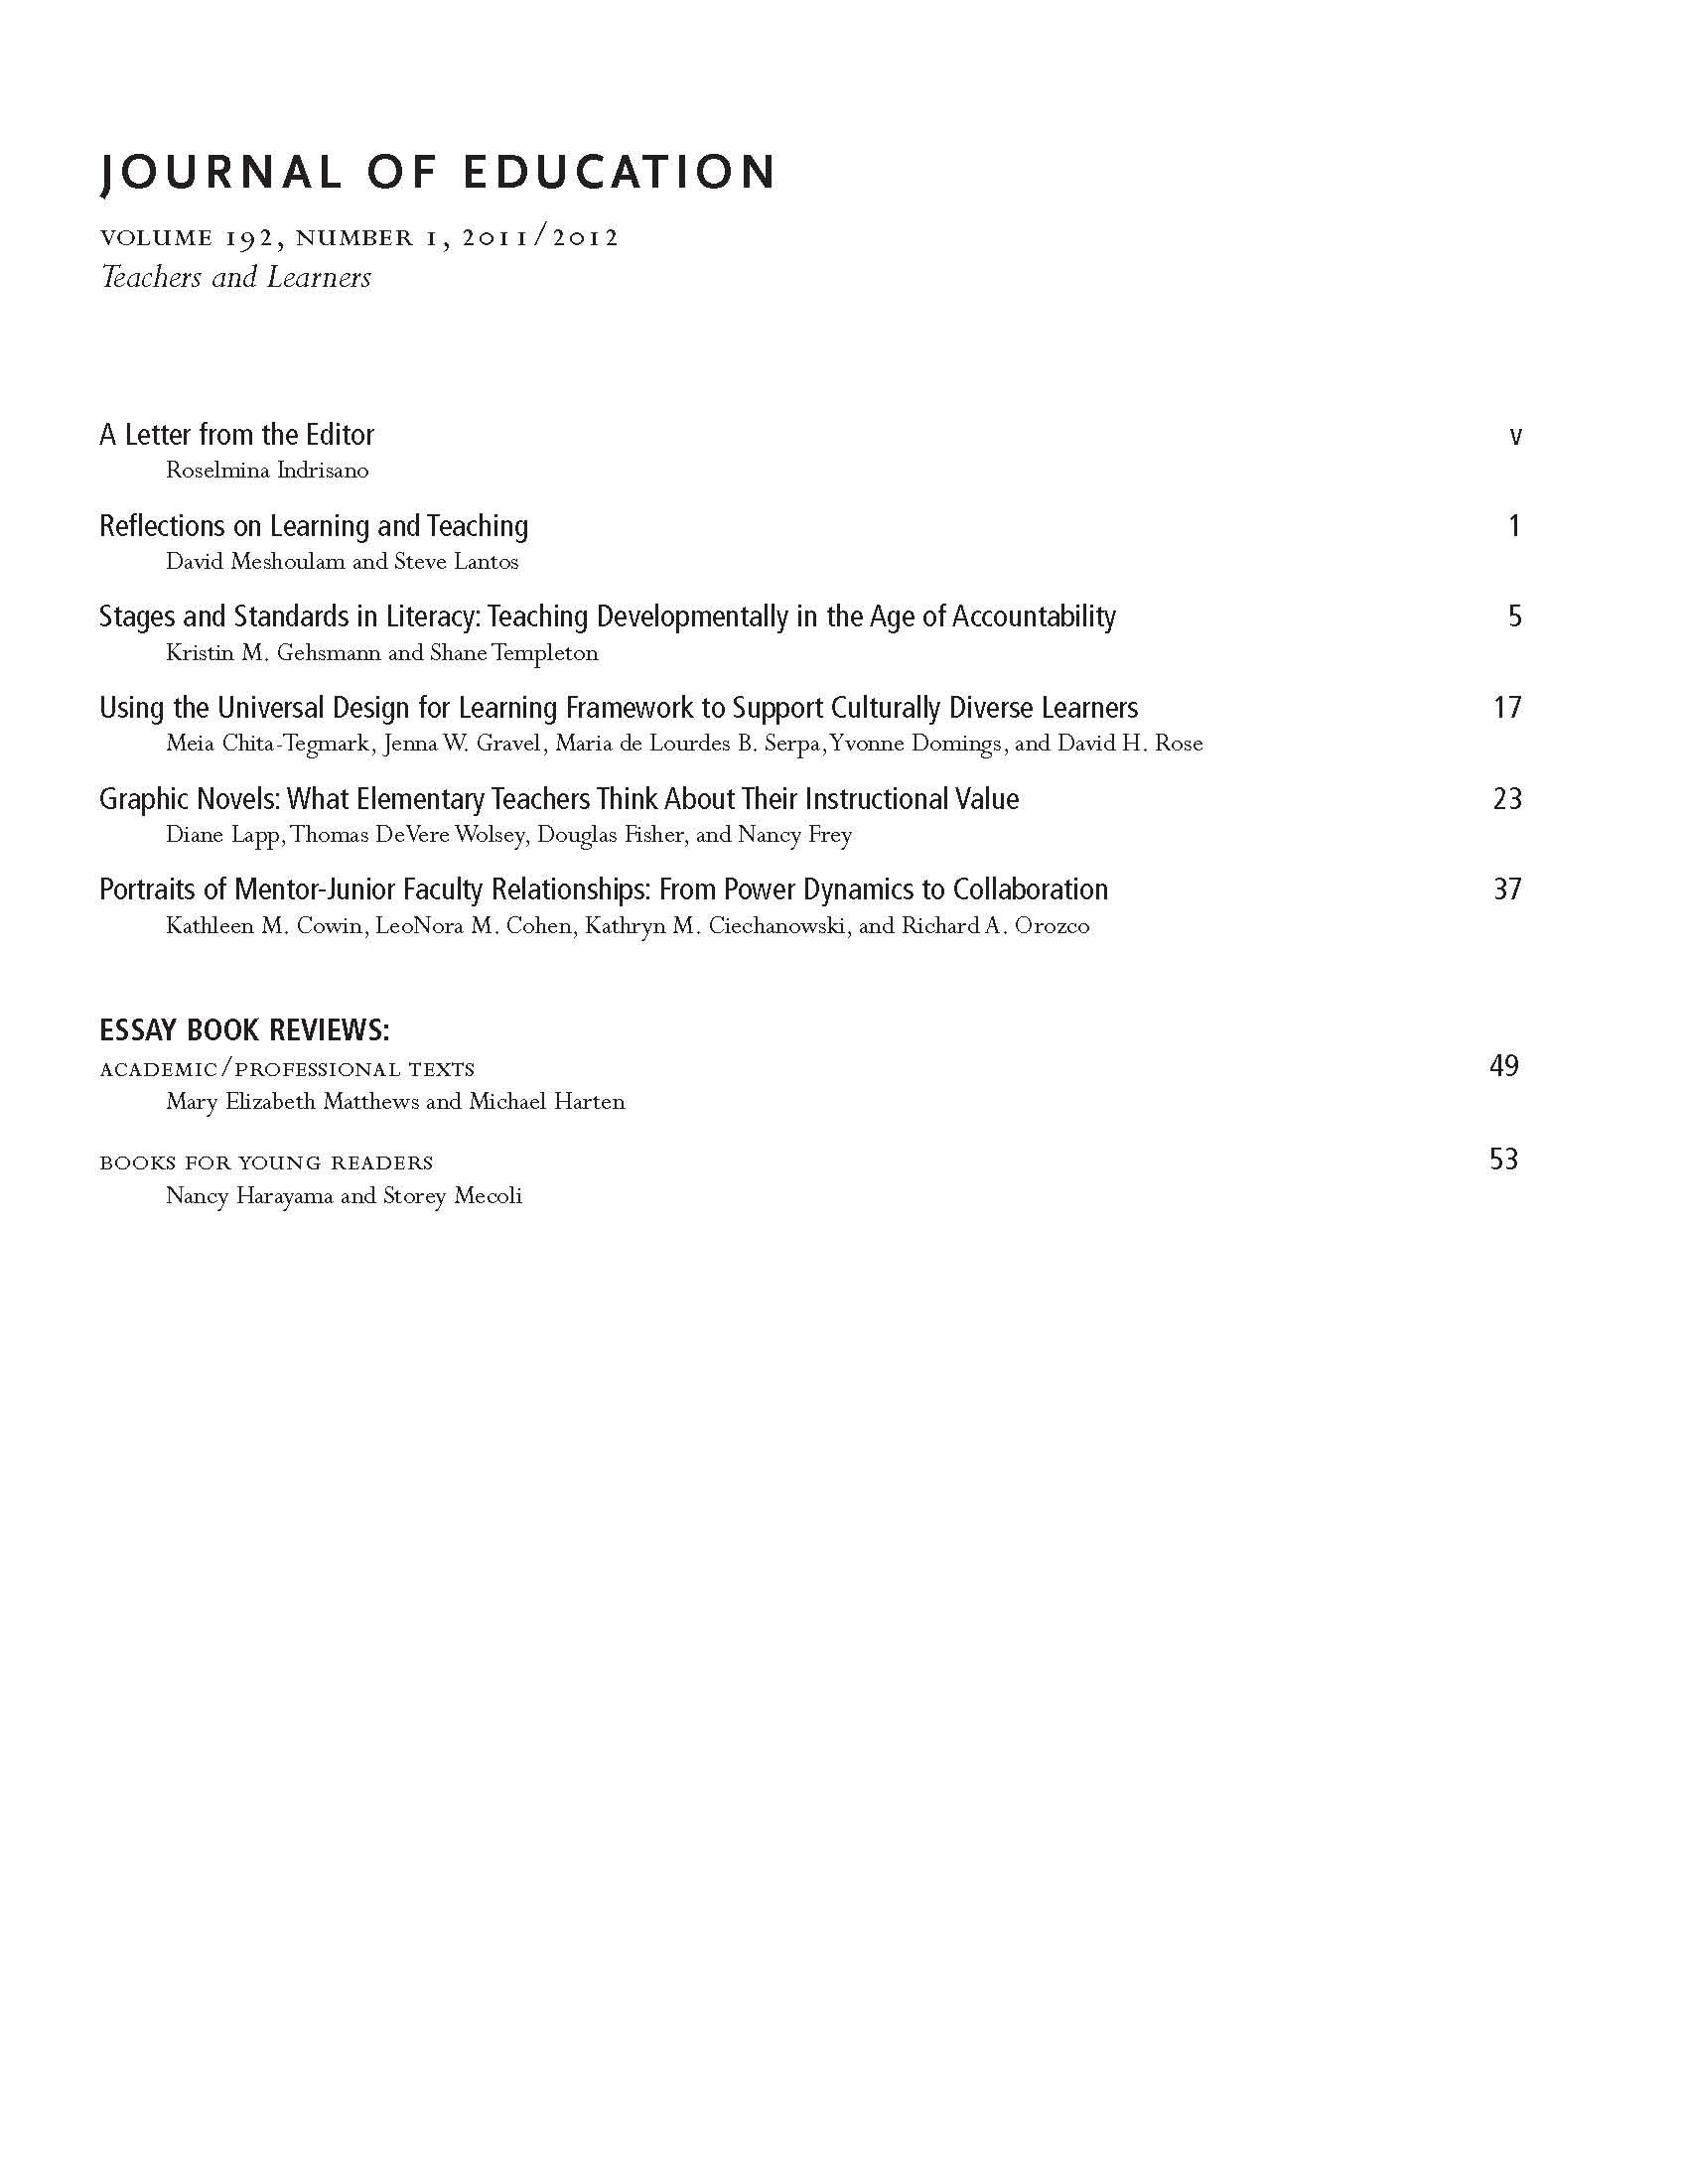 Volume 192, 2011-2012 » Journal of Education | Boston University